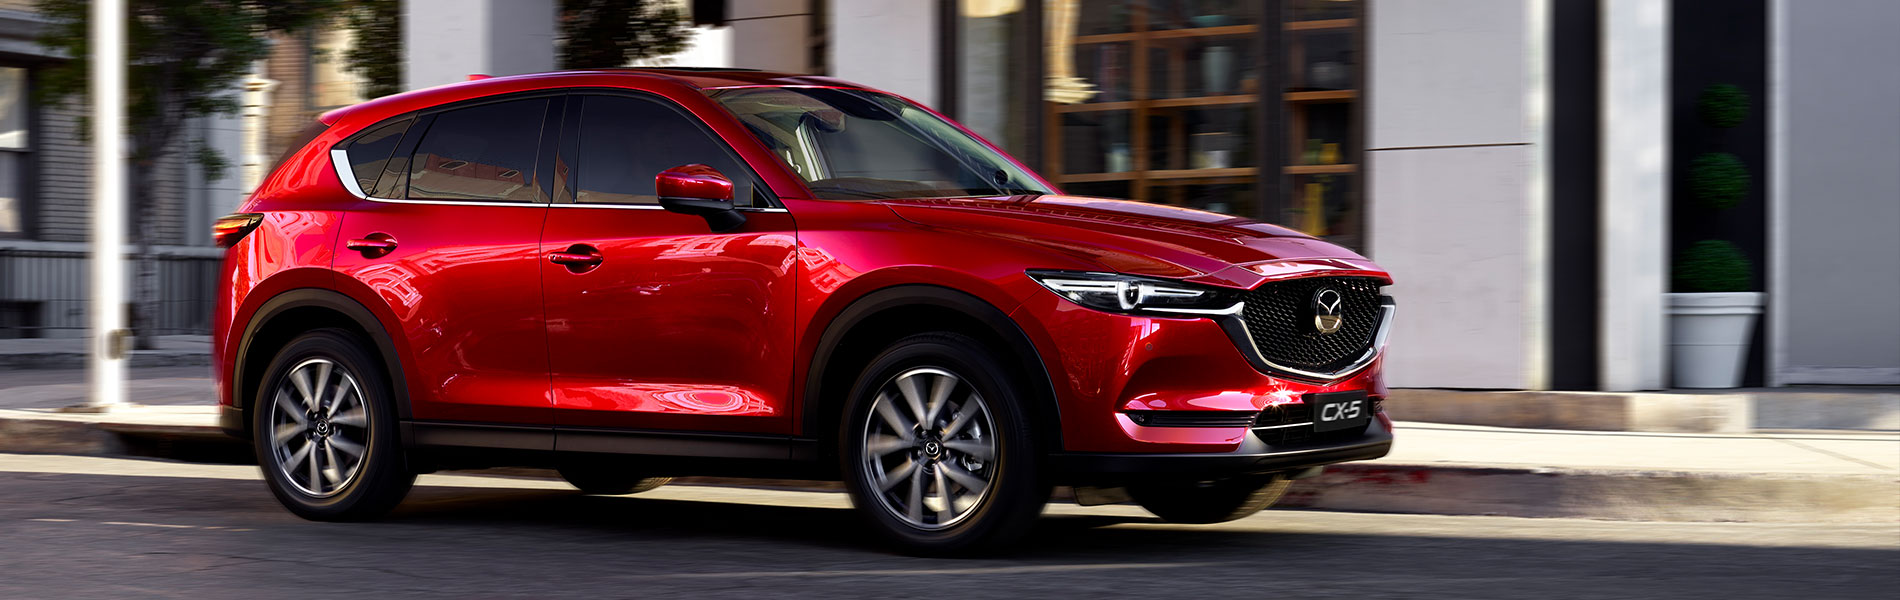 Mazda Next-Gen CX-5 Image 3